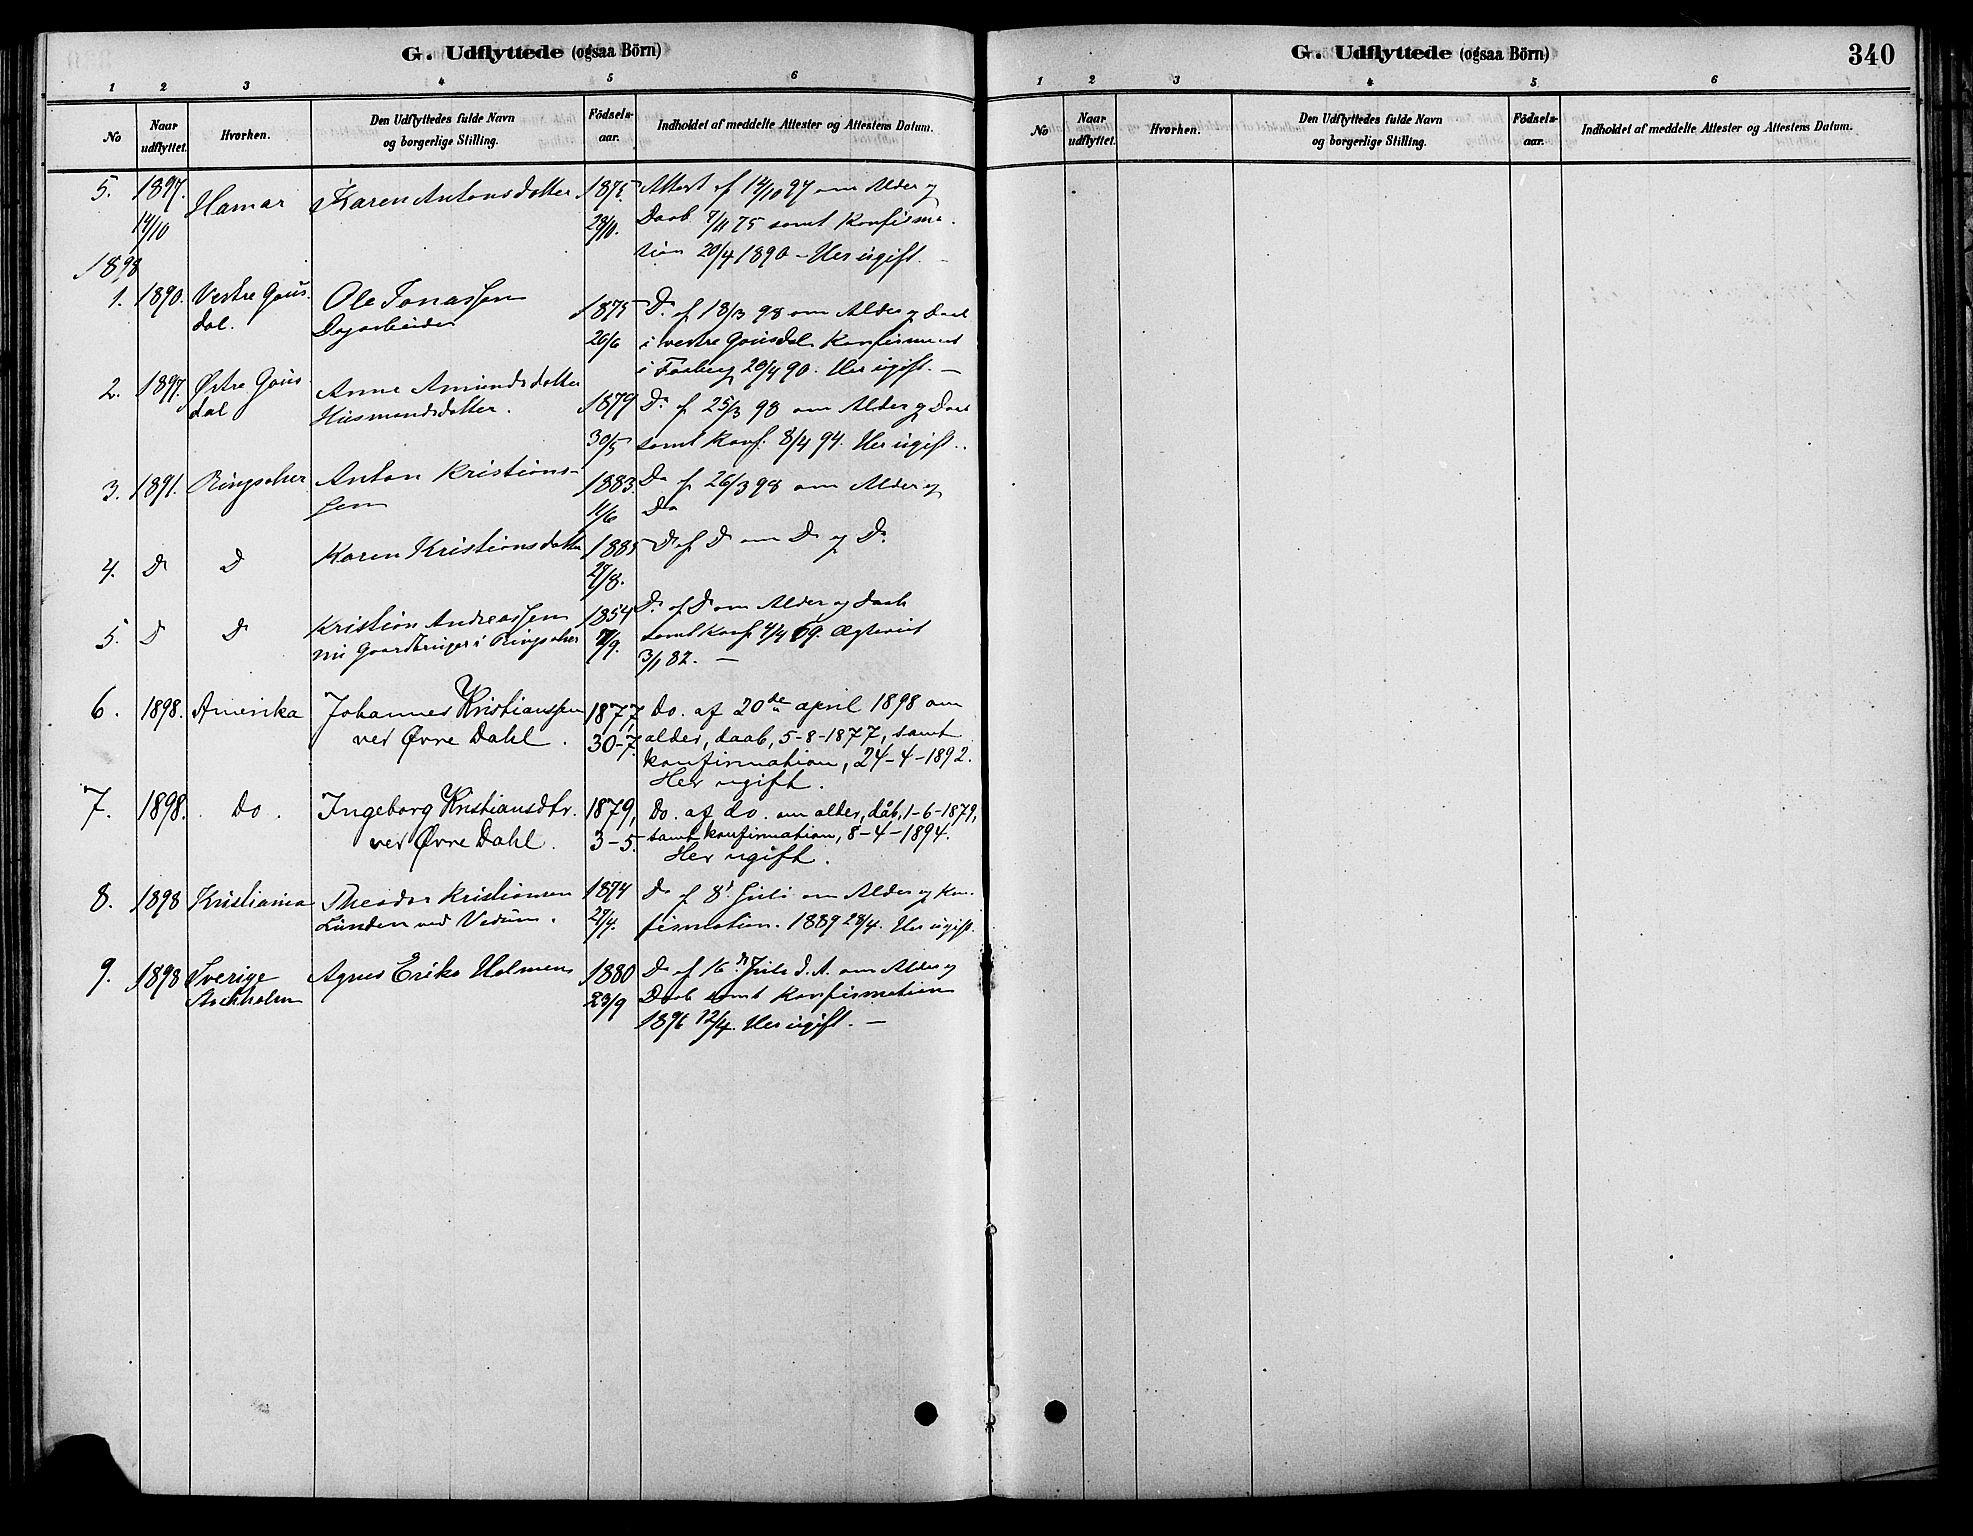 SAH, Fåberg prestekontor, Ministerialbok nr. 8, 1879-1898, s. 340